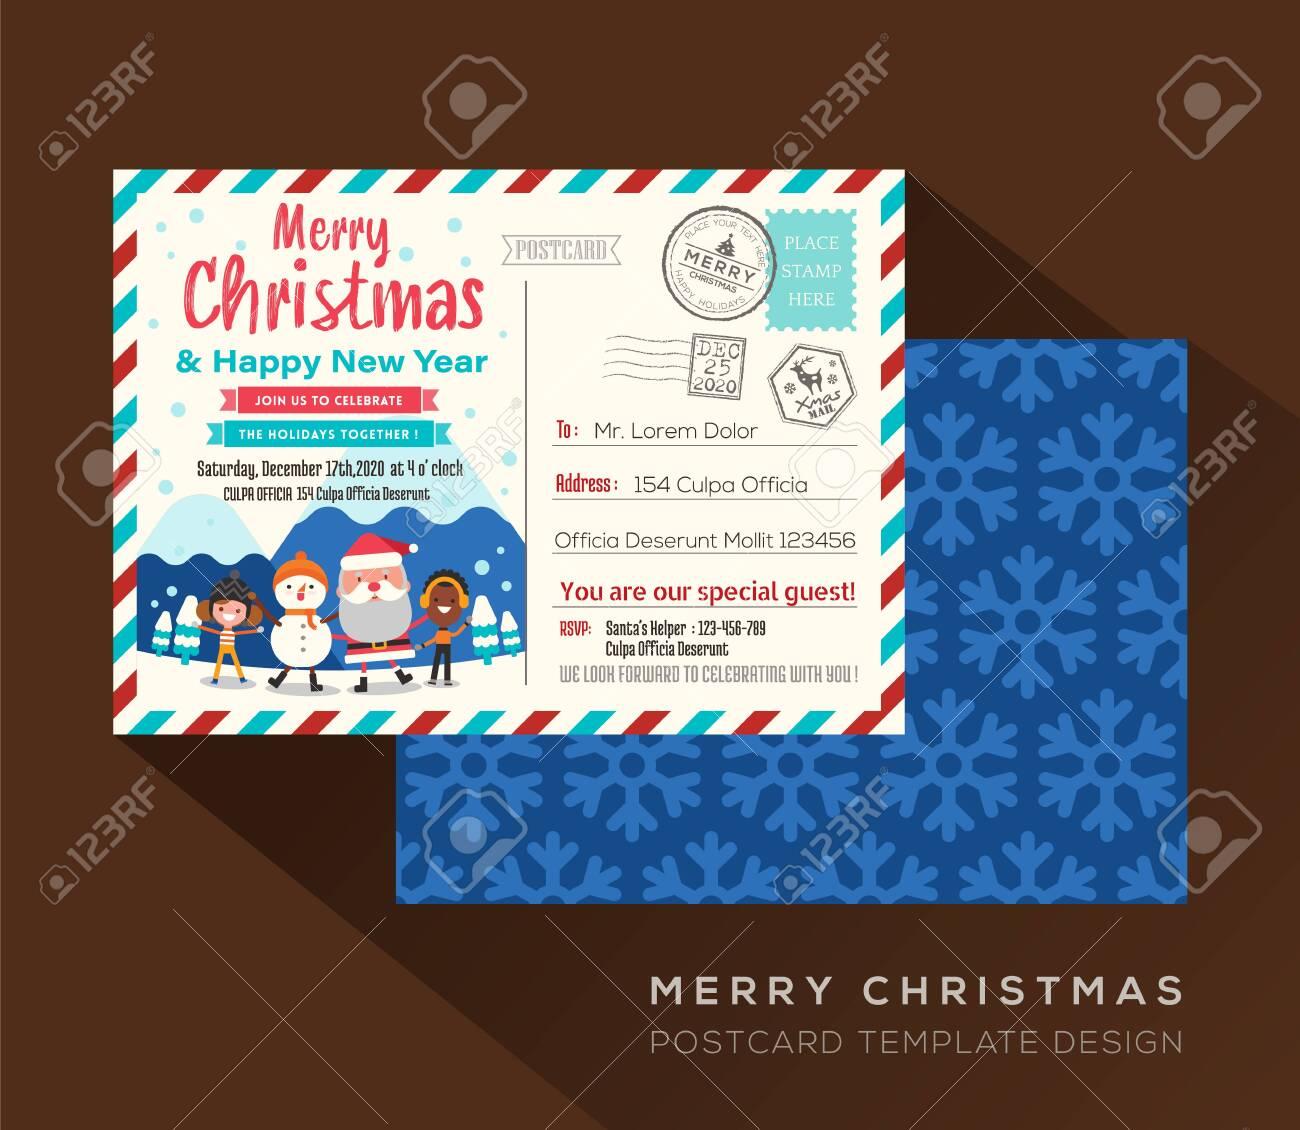 Merry Christmas postcard invitation card design Vector Template - 133553434